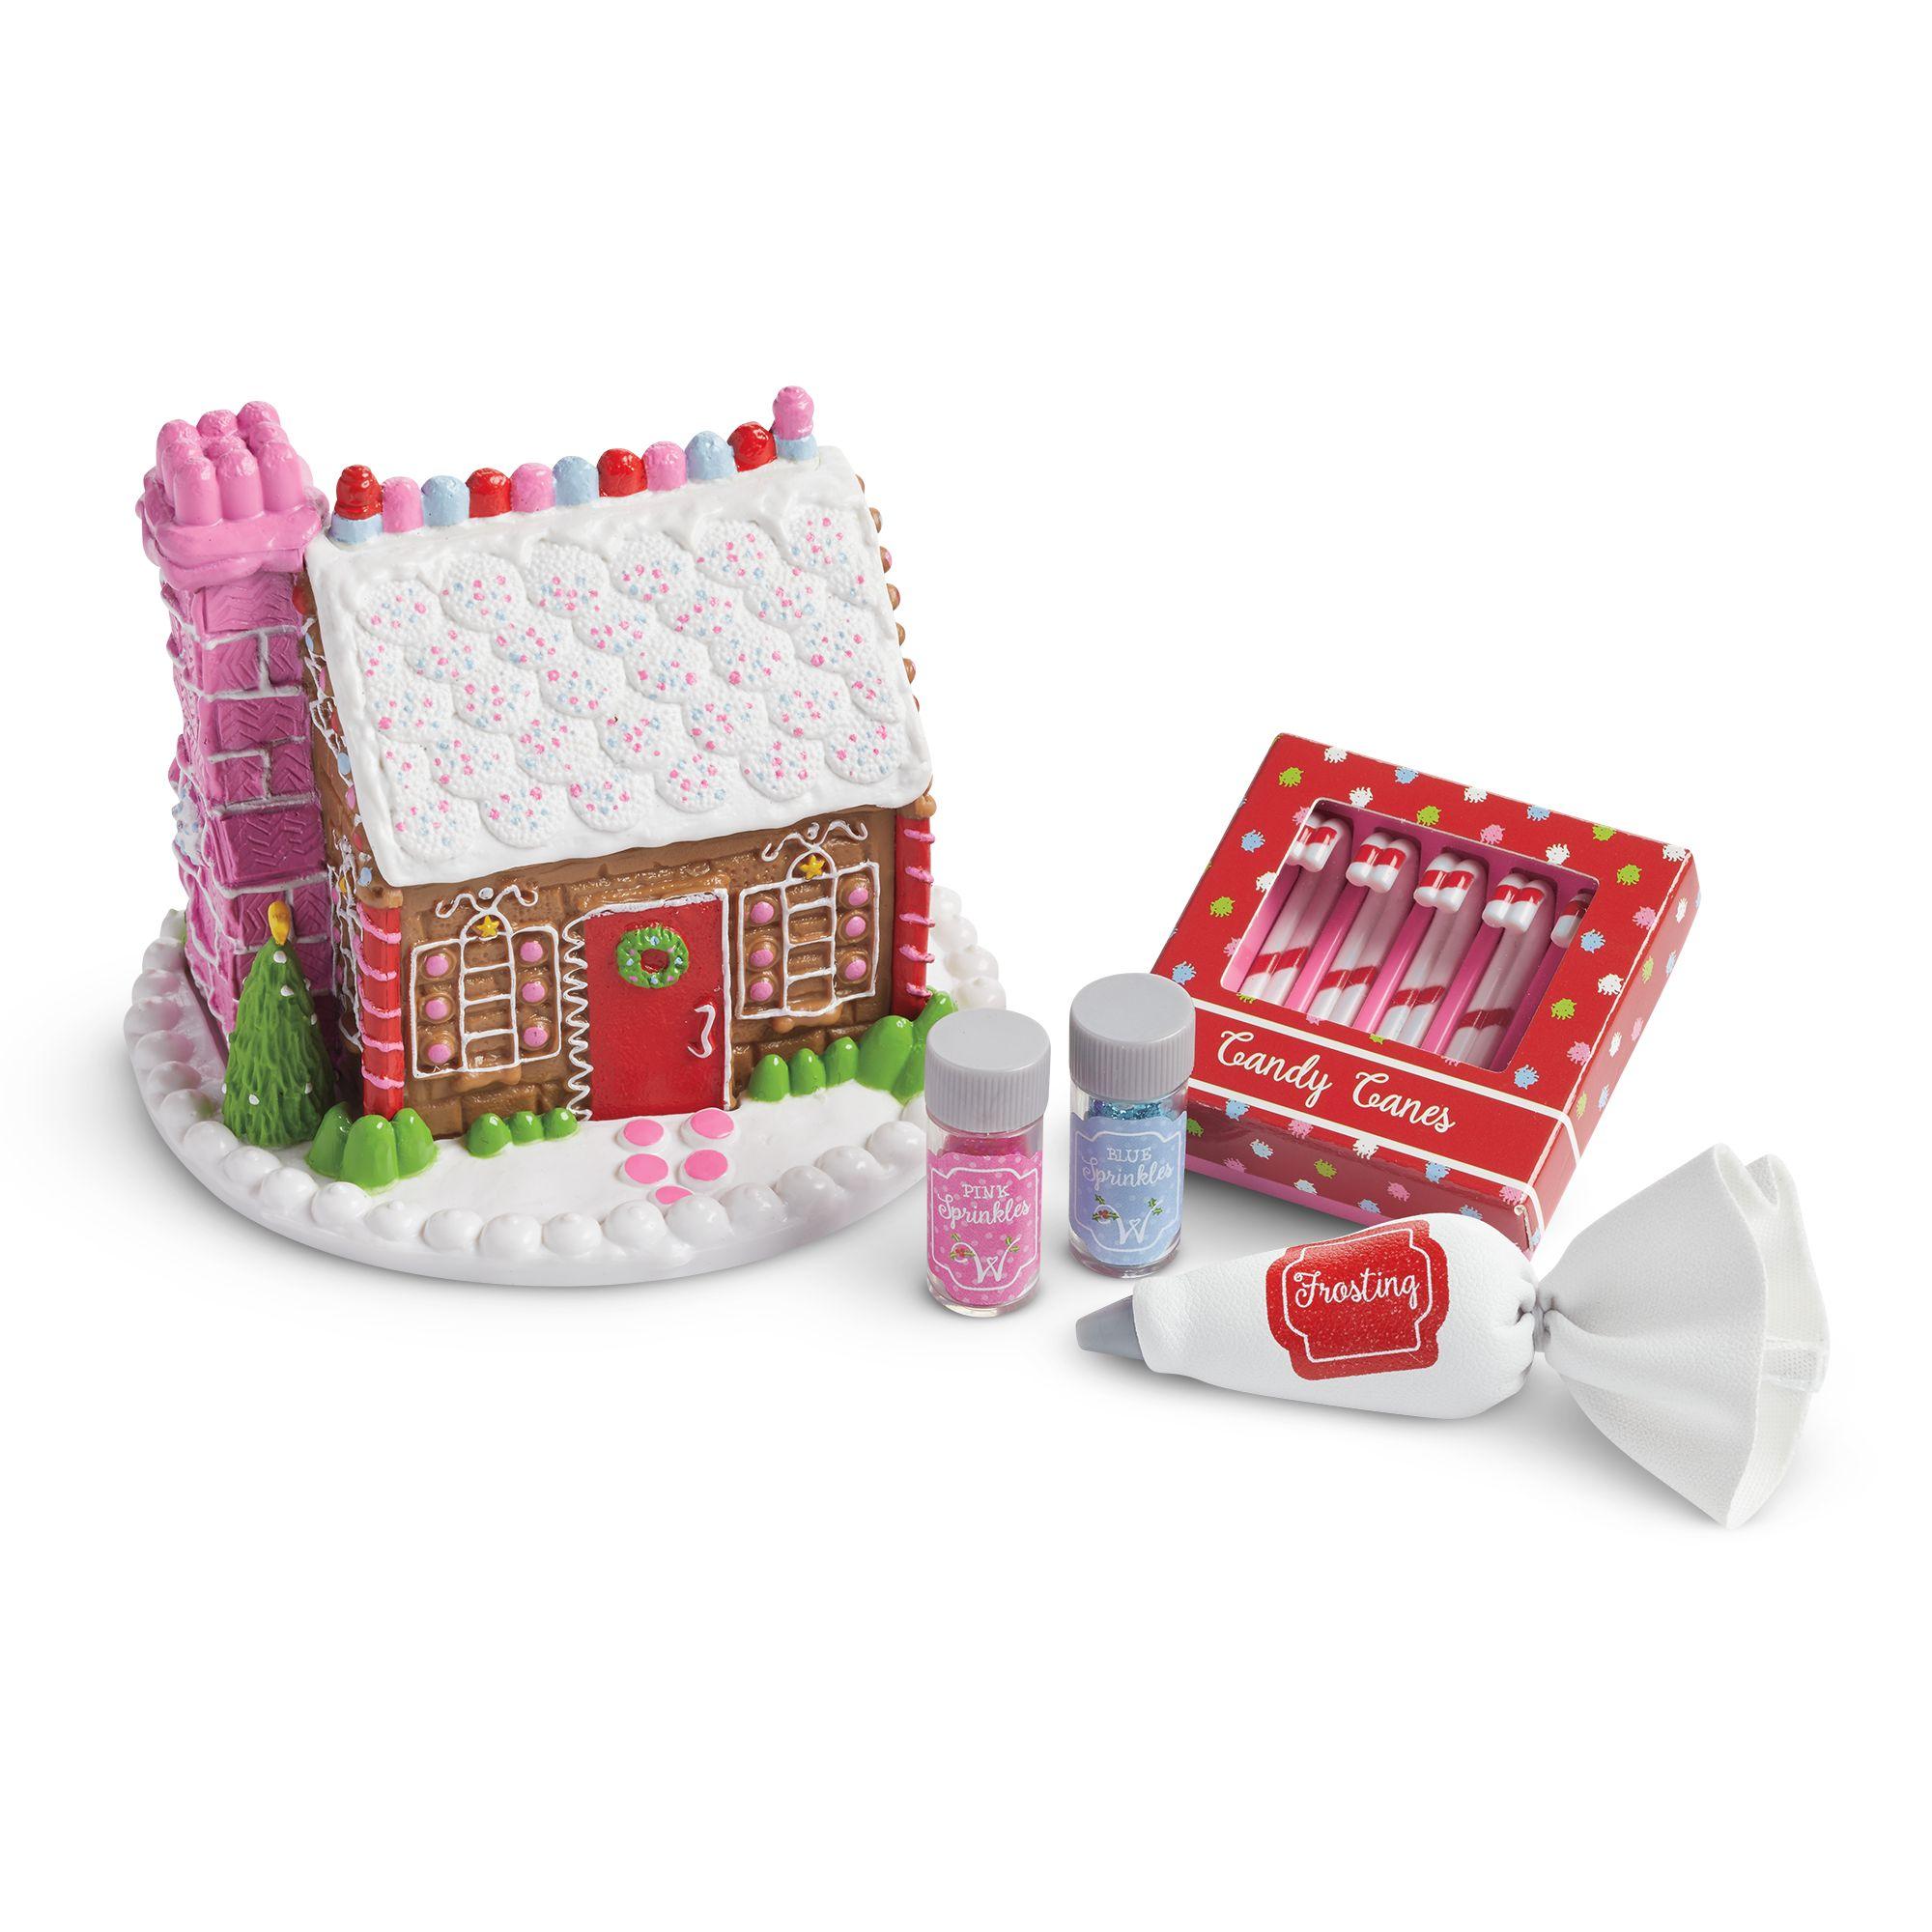 Festive Gingerbread House Set